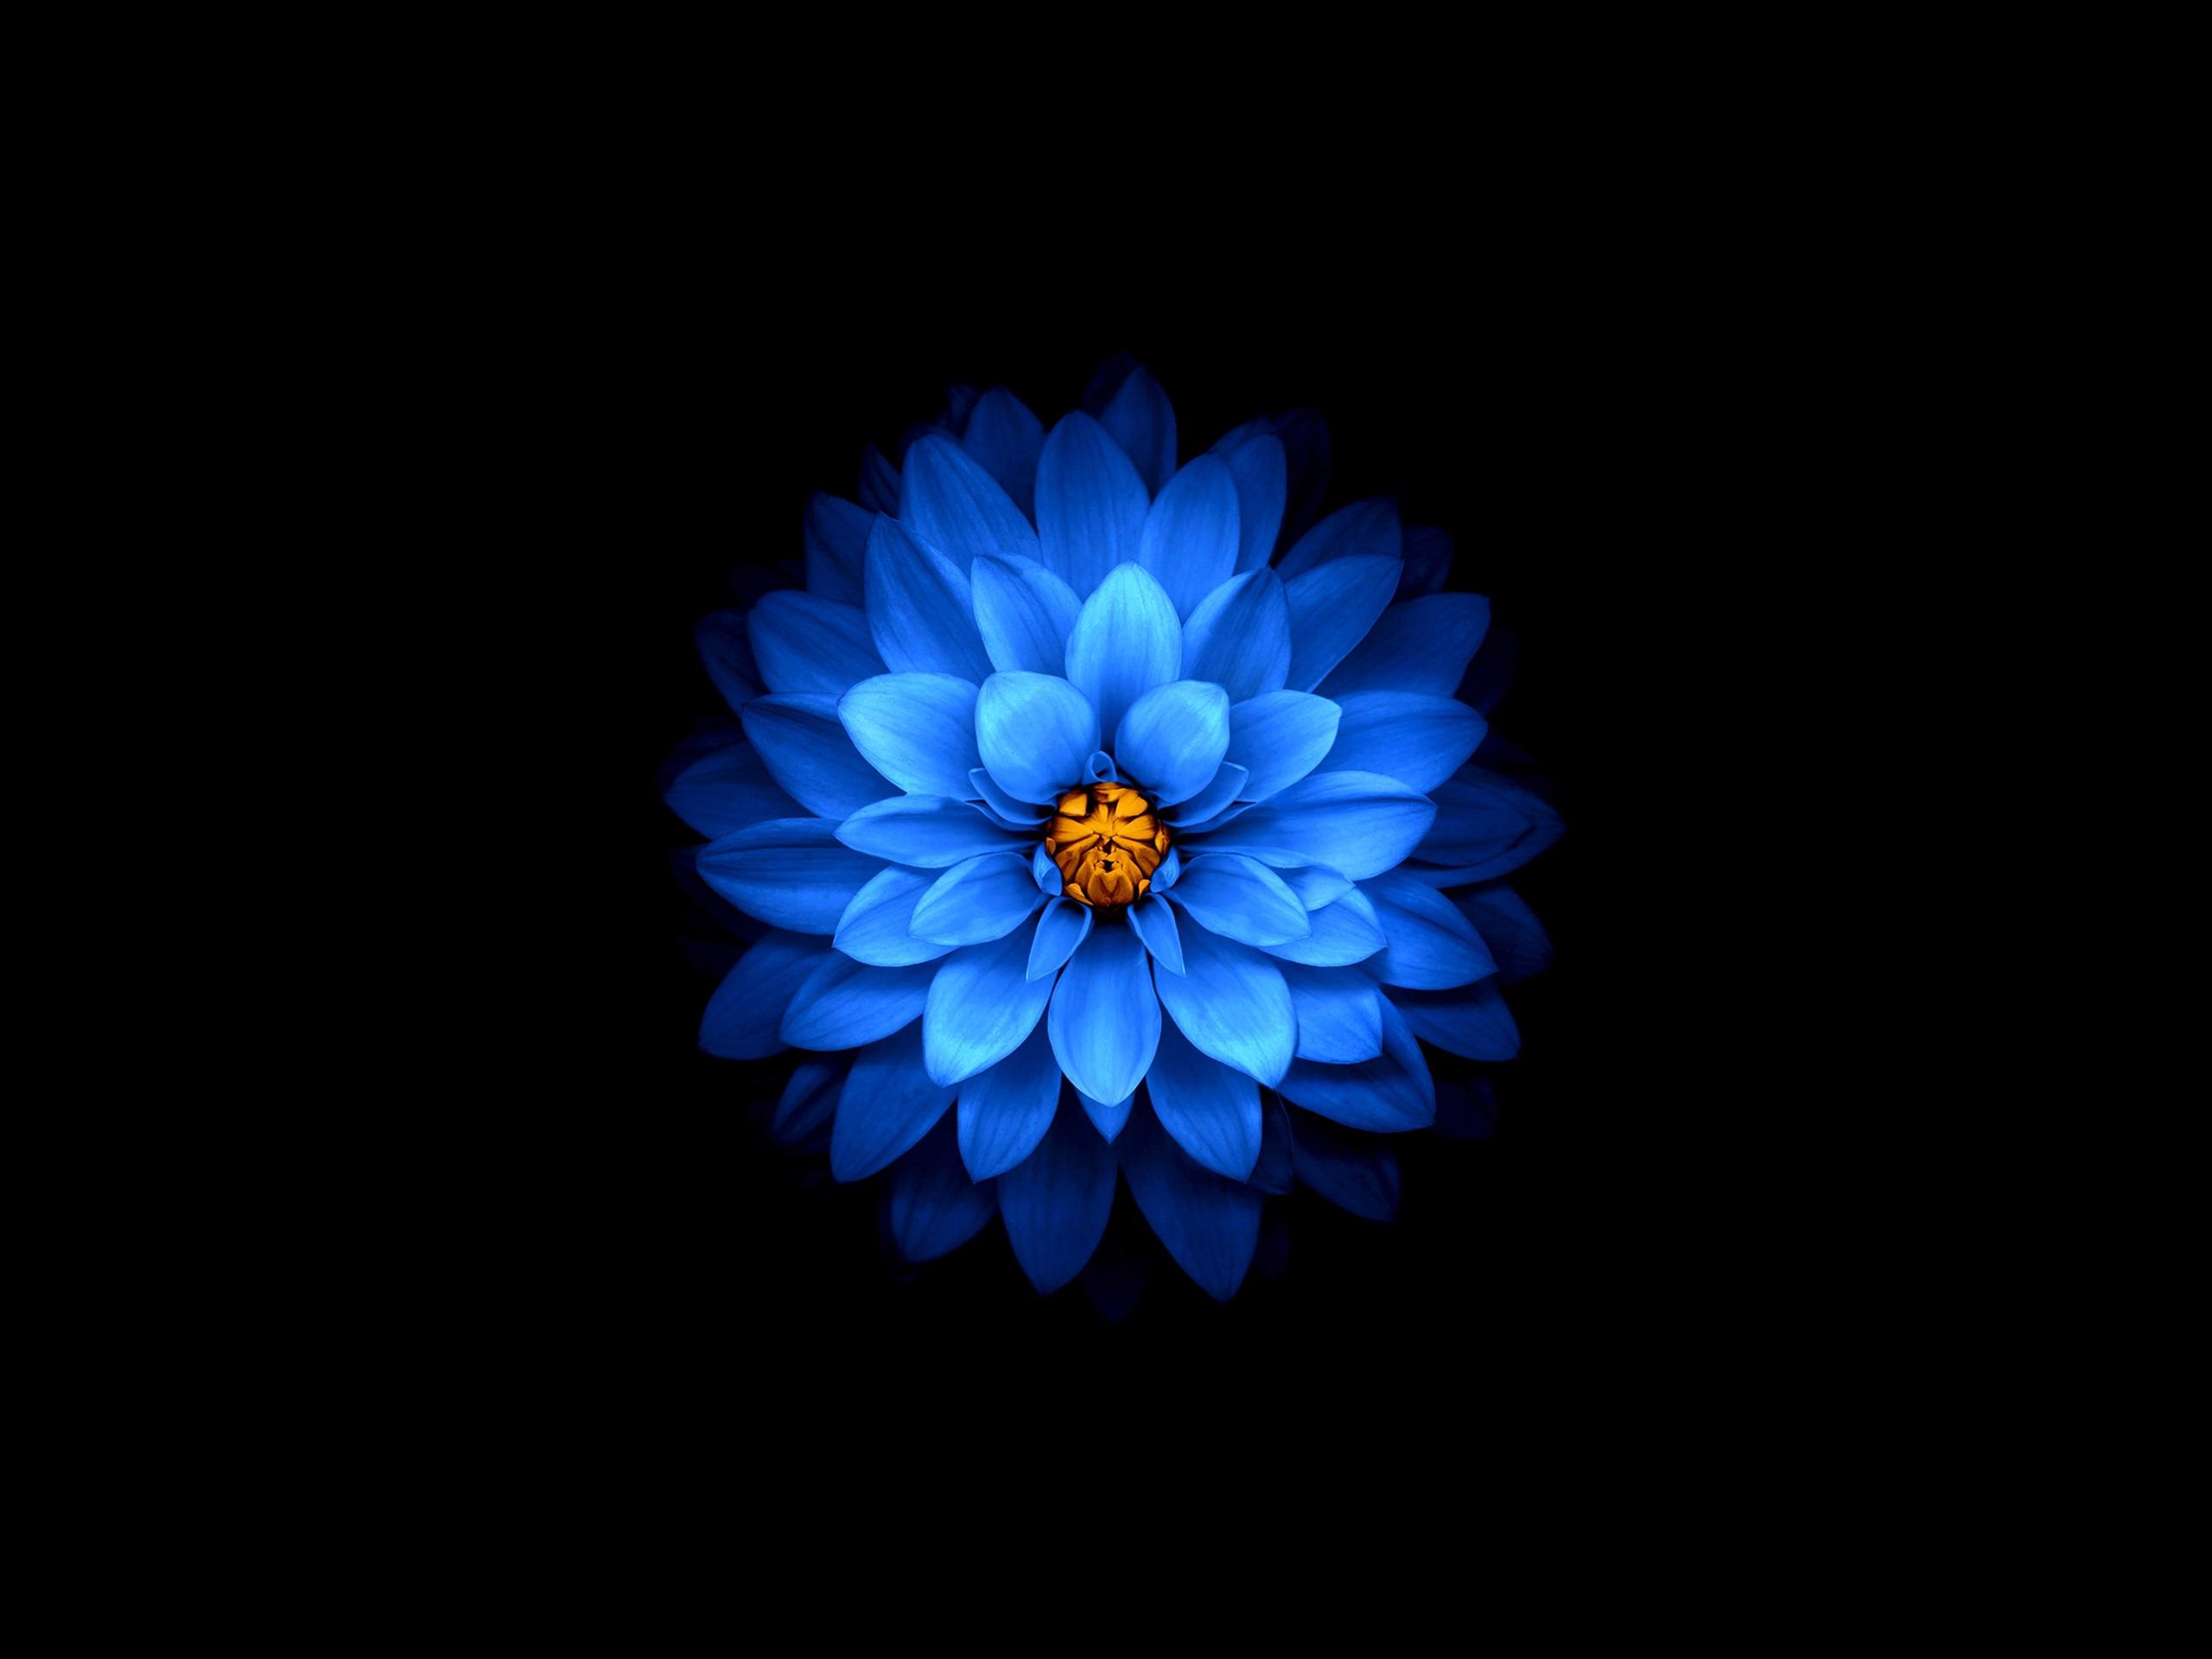 Обои на айфон цветы на темном фоне